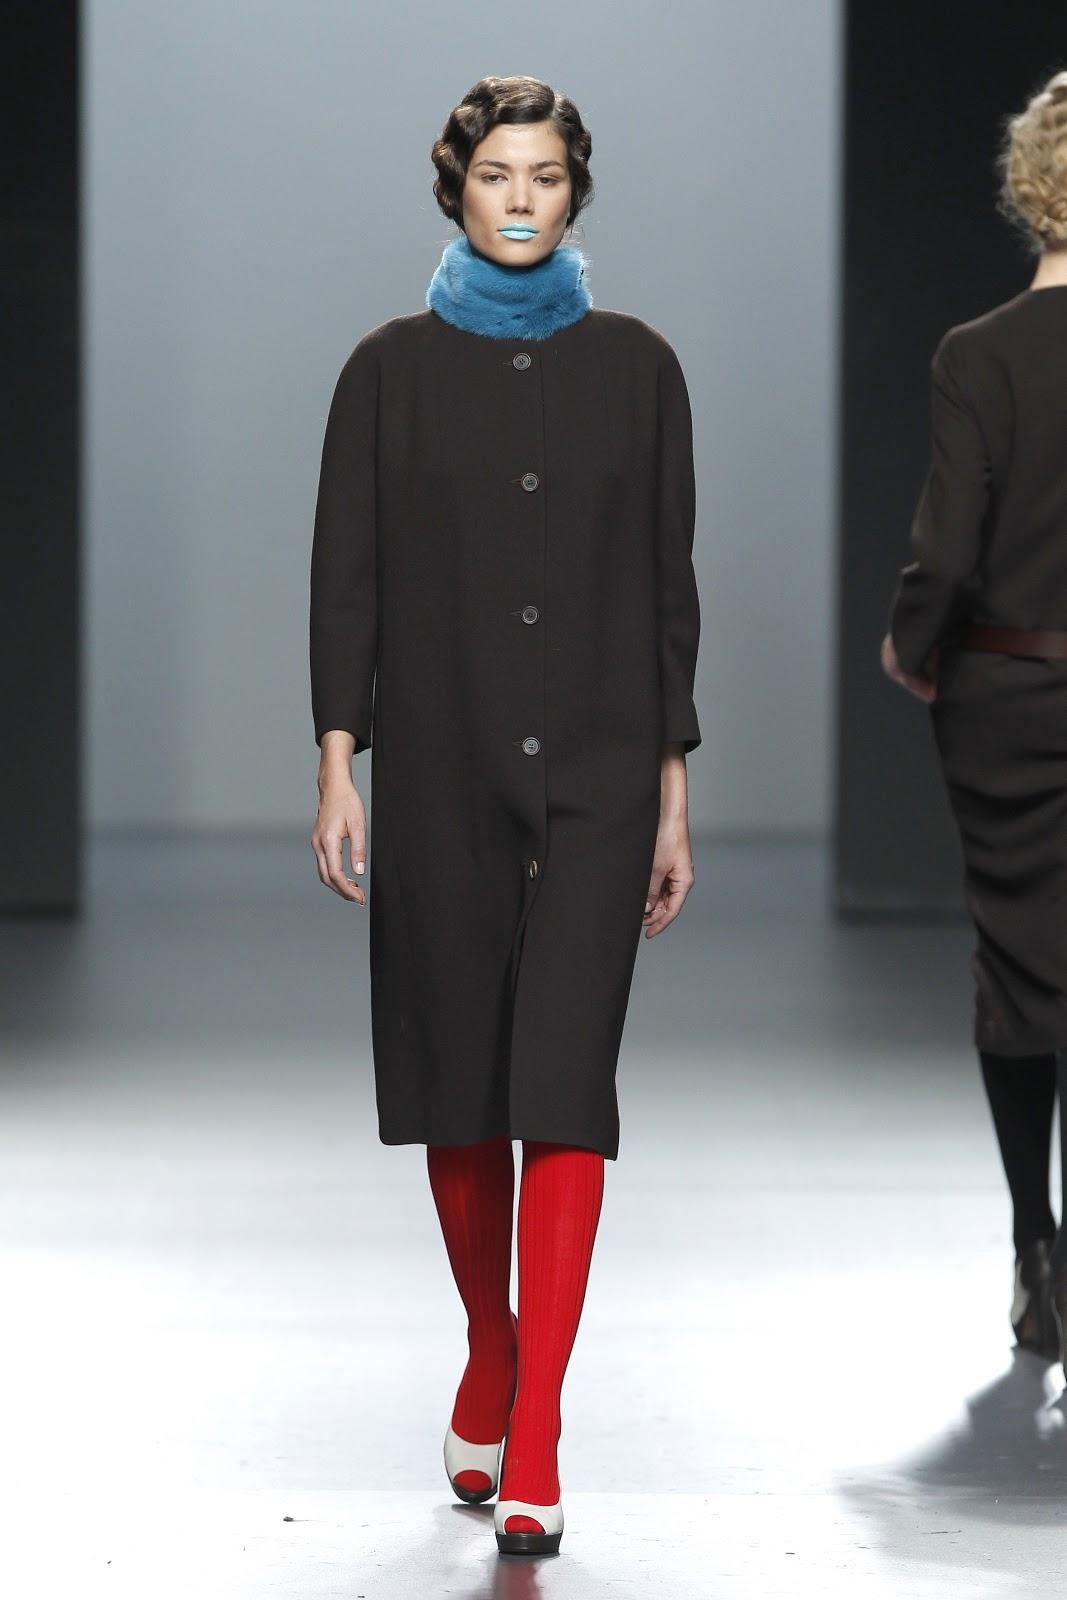 Fashion runway lemoniez madrid fashion week fall winter - Madrid chic style ...